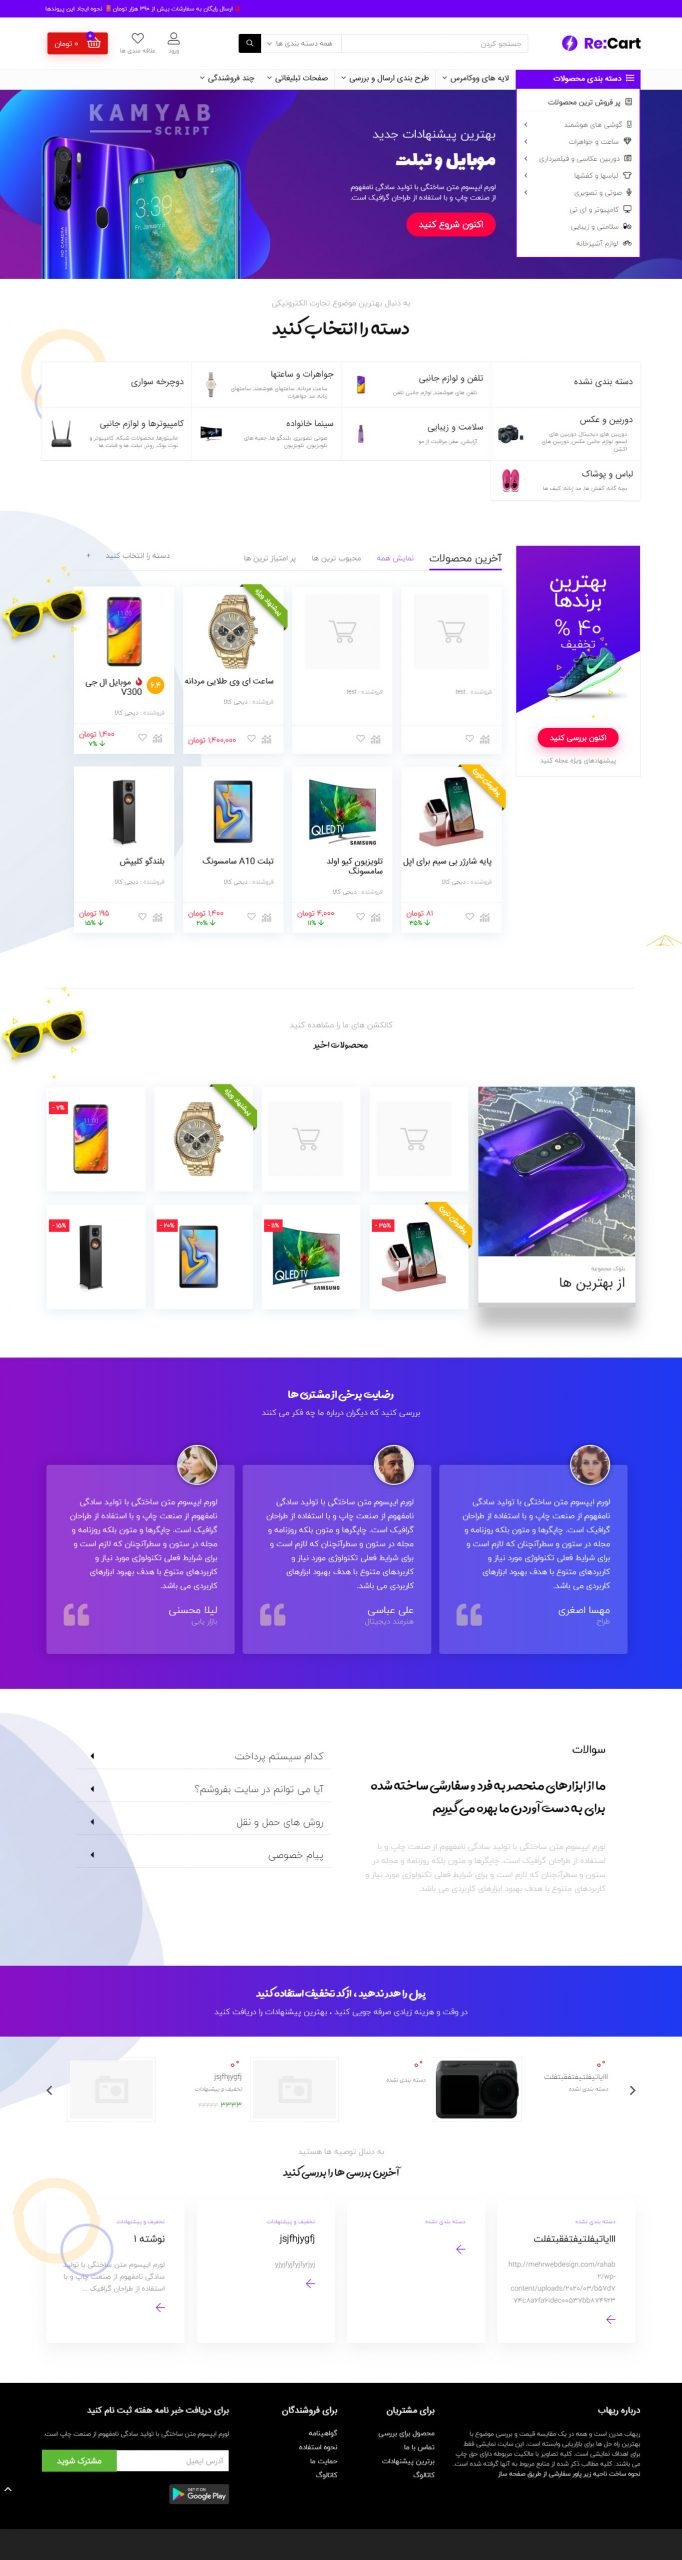 rehub banner kamyabscript.ir  scaled - قالب فروشگاهی و چند فروشندگی REHub فارسی برای وردپرس نسخه ۹/۹/۷